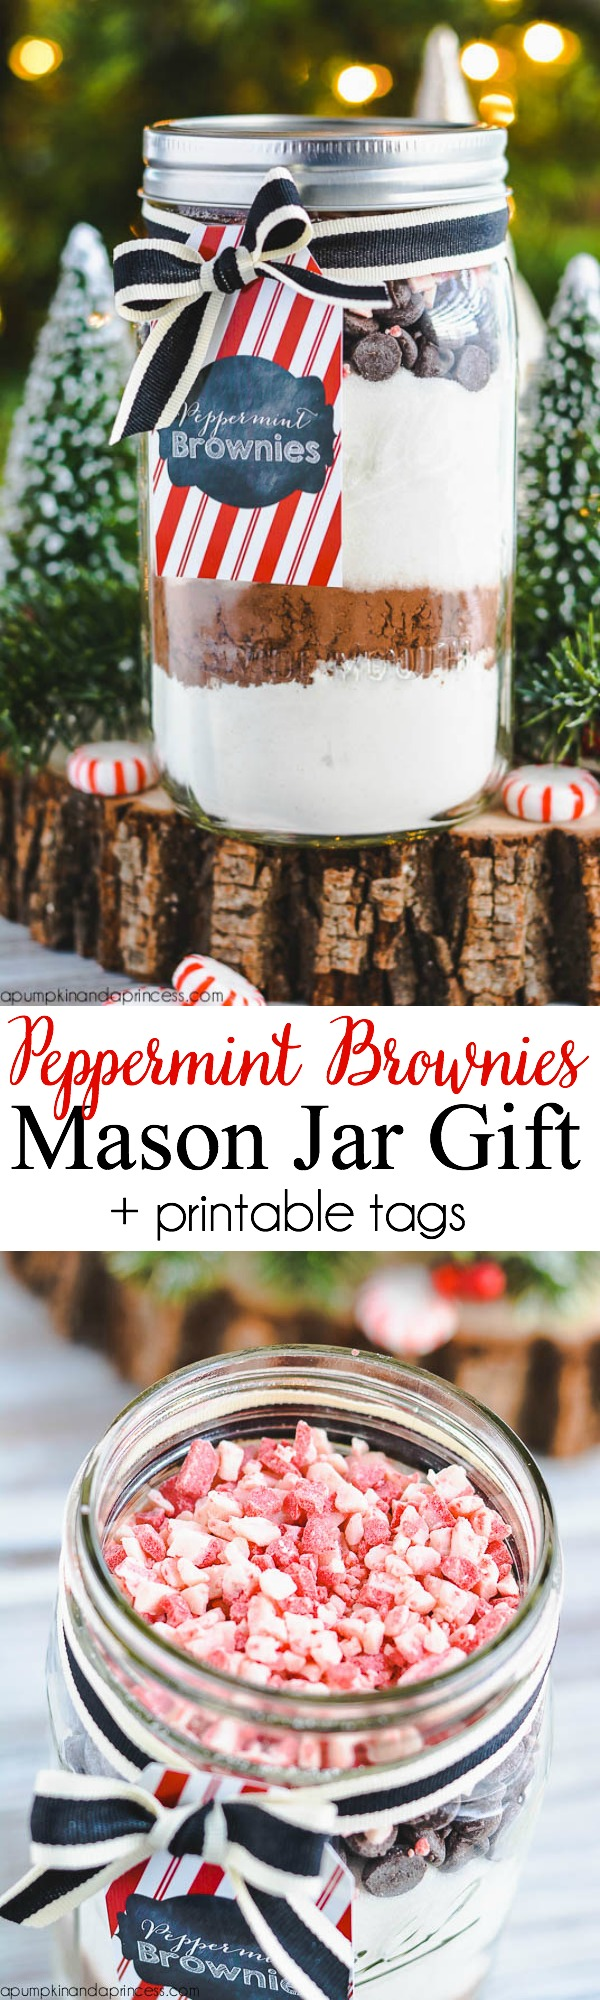 Peppermint-Brownie-Mix-Mason-Jar-Gift